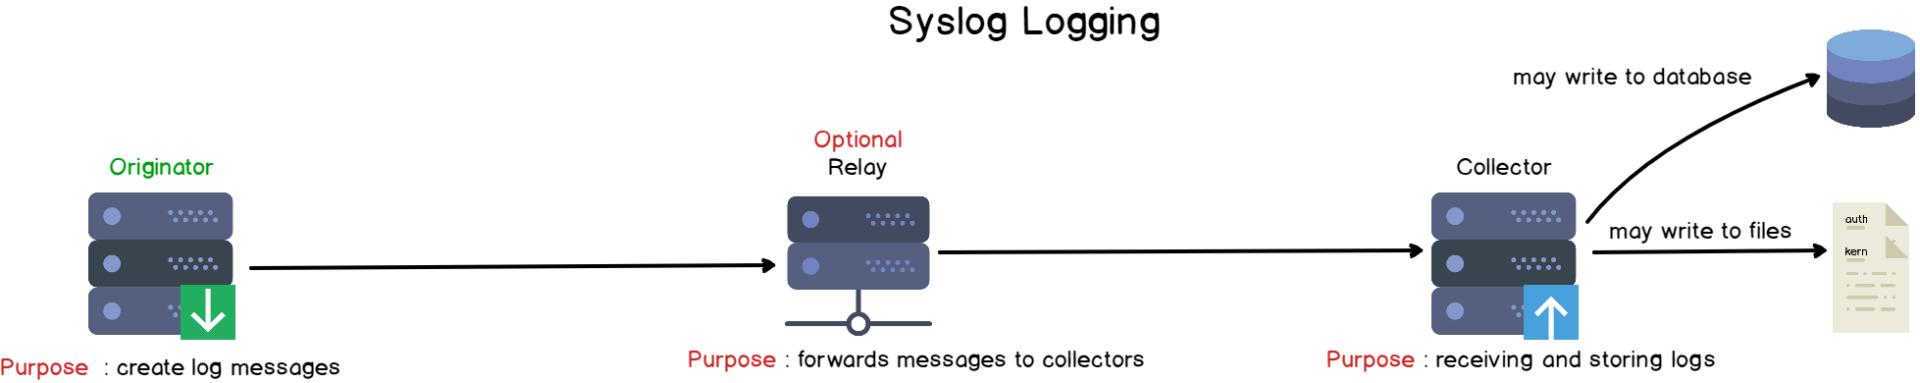 Syslog Architecture syslog